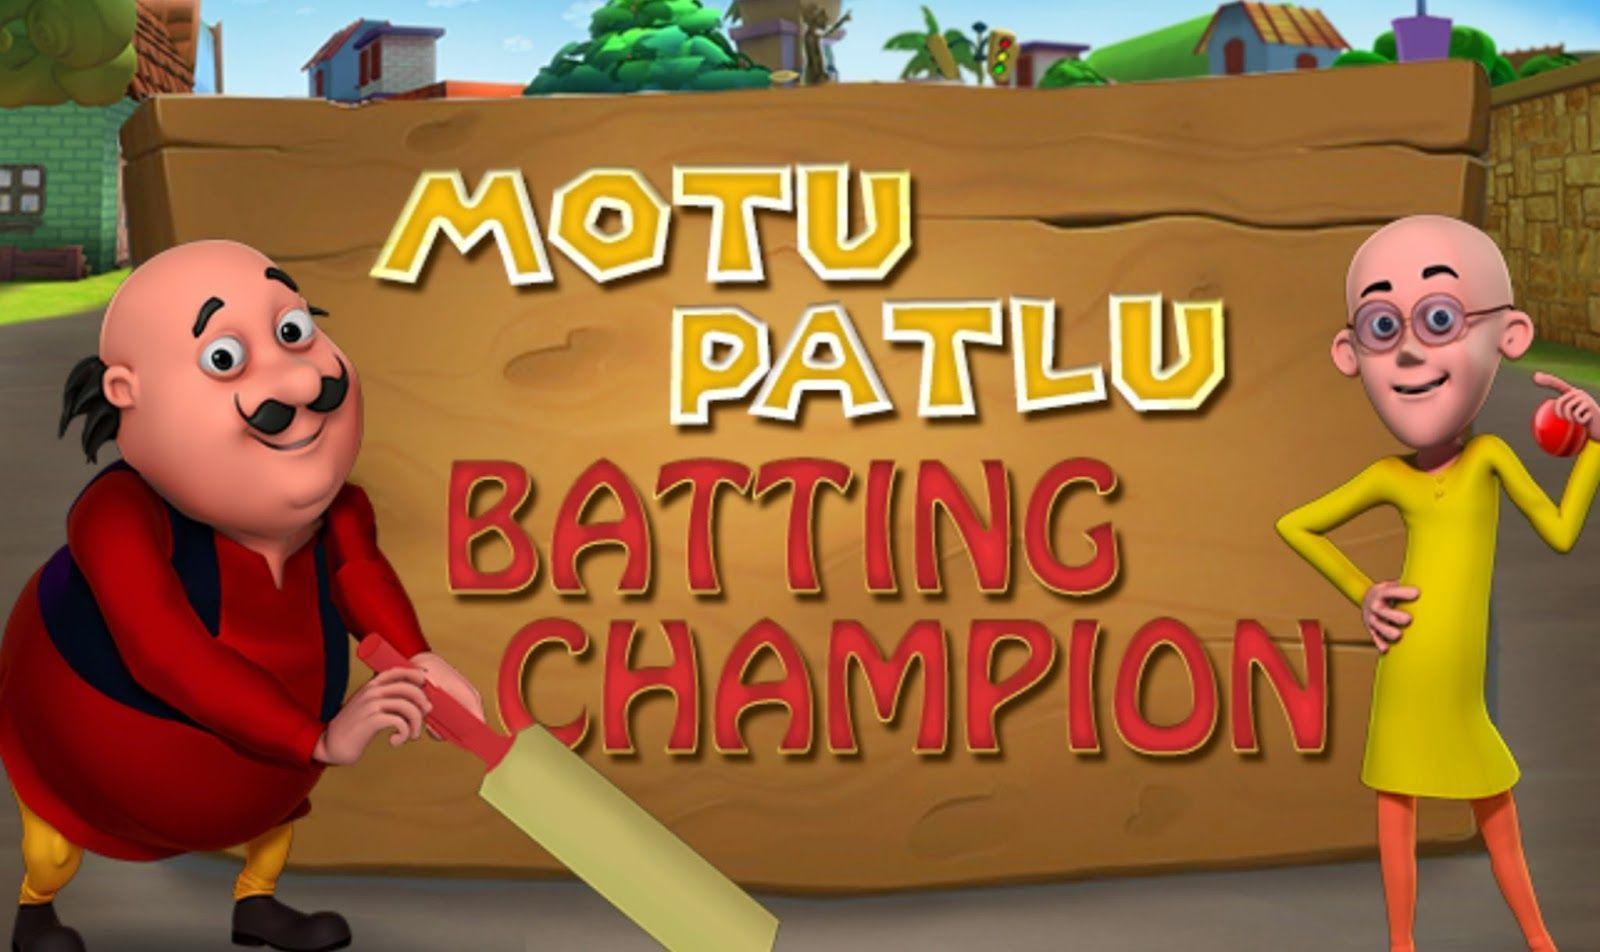 Free Download Motu Patlu HD Wallpapers images